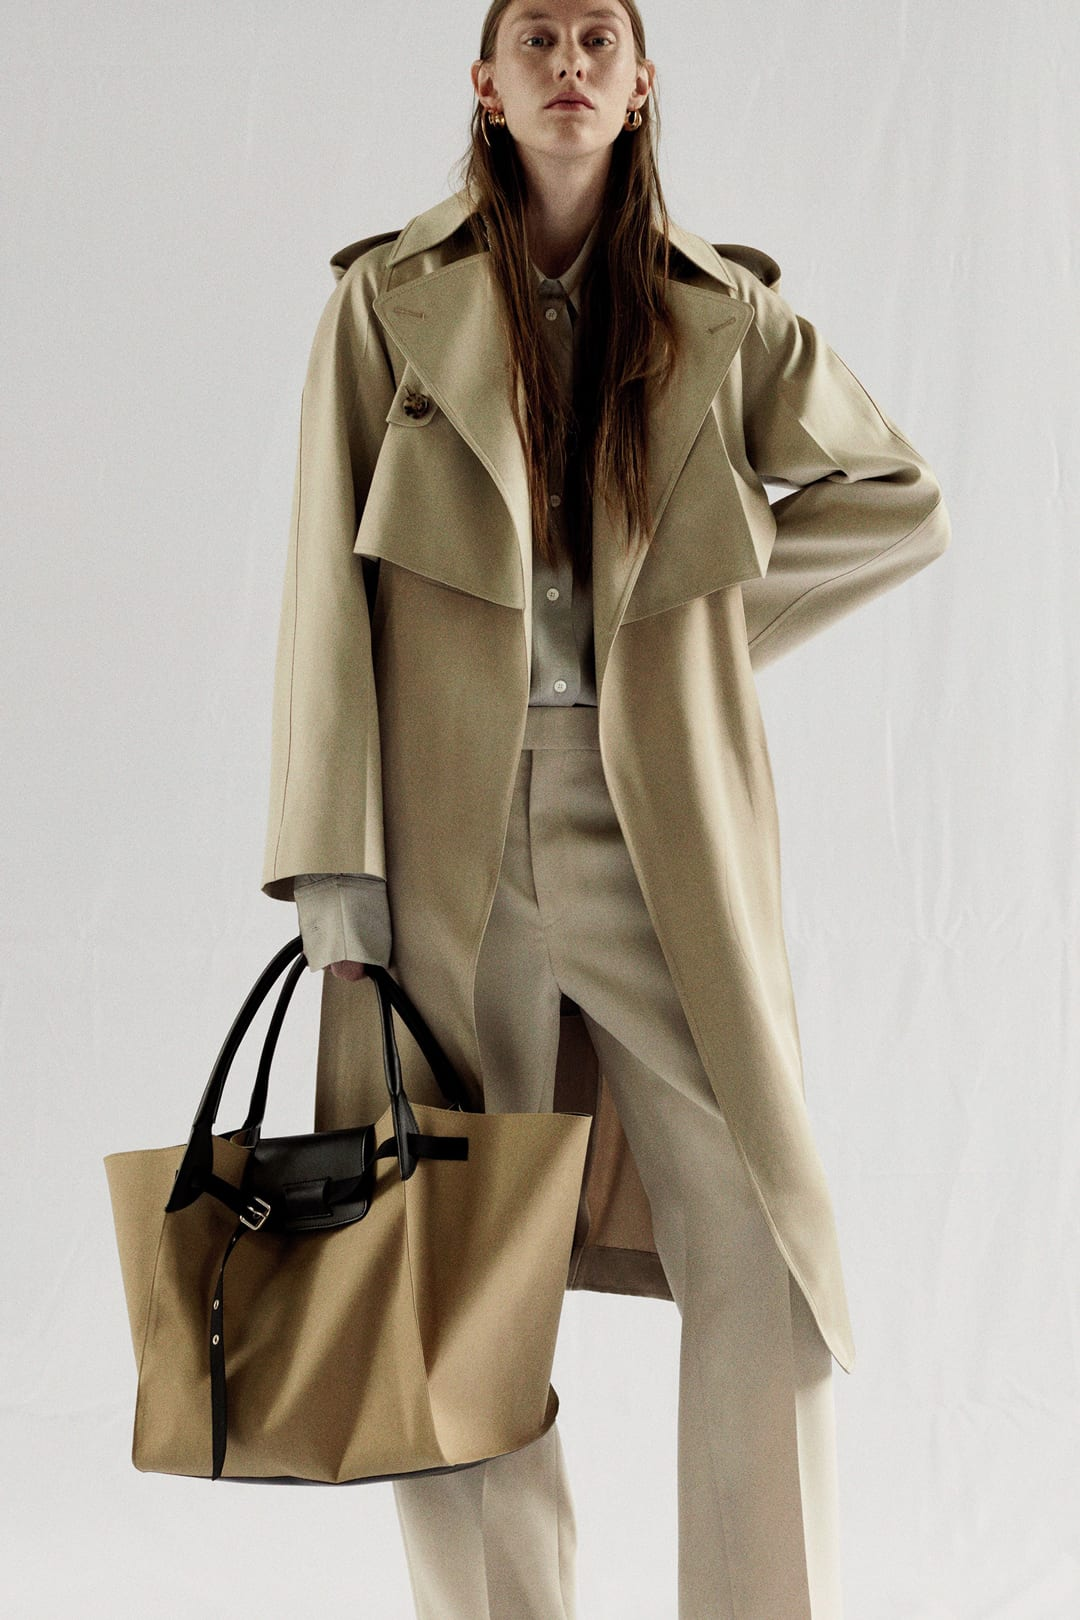 Céline Resort 2018 | Style&Minimalism Black Suit Styles